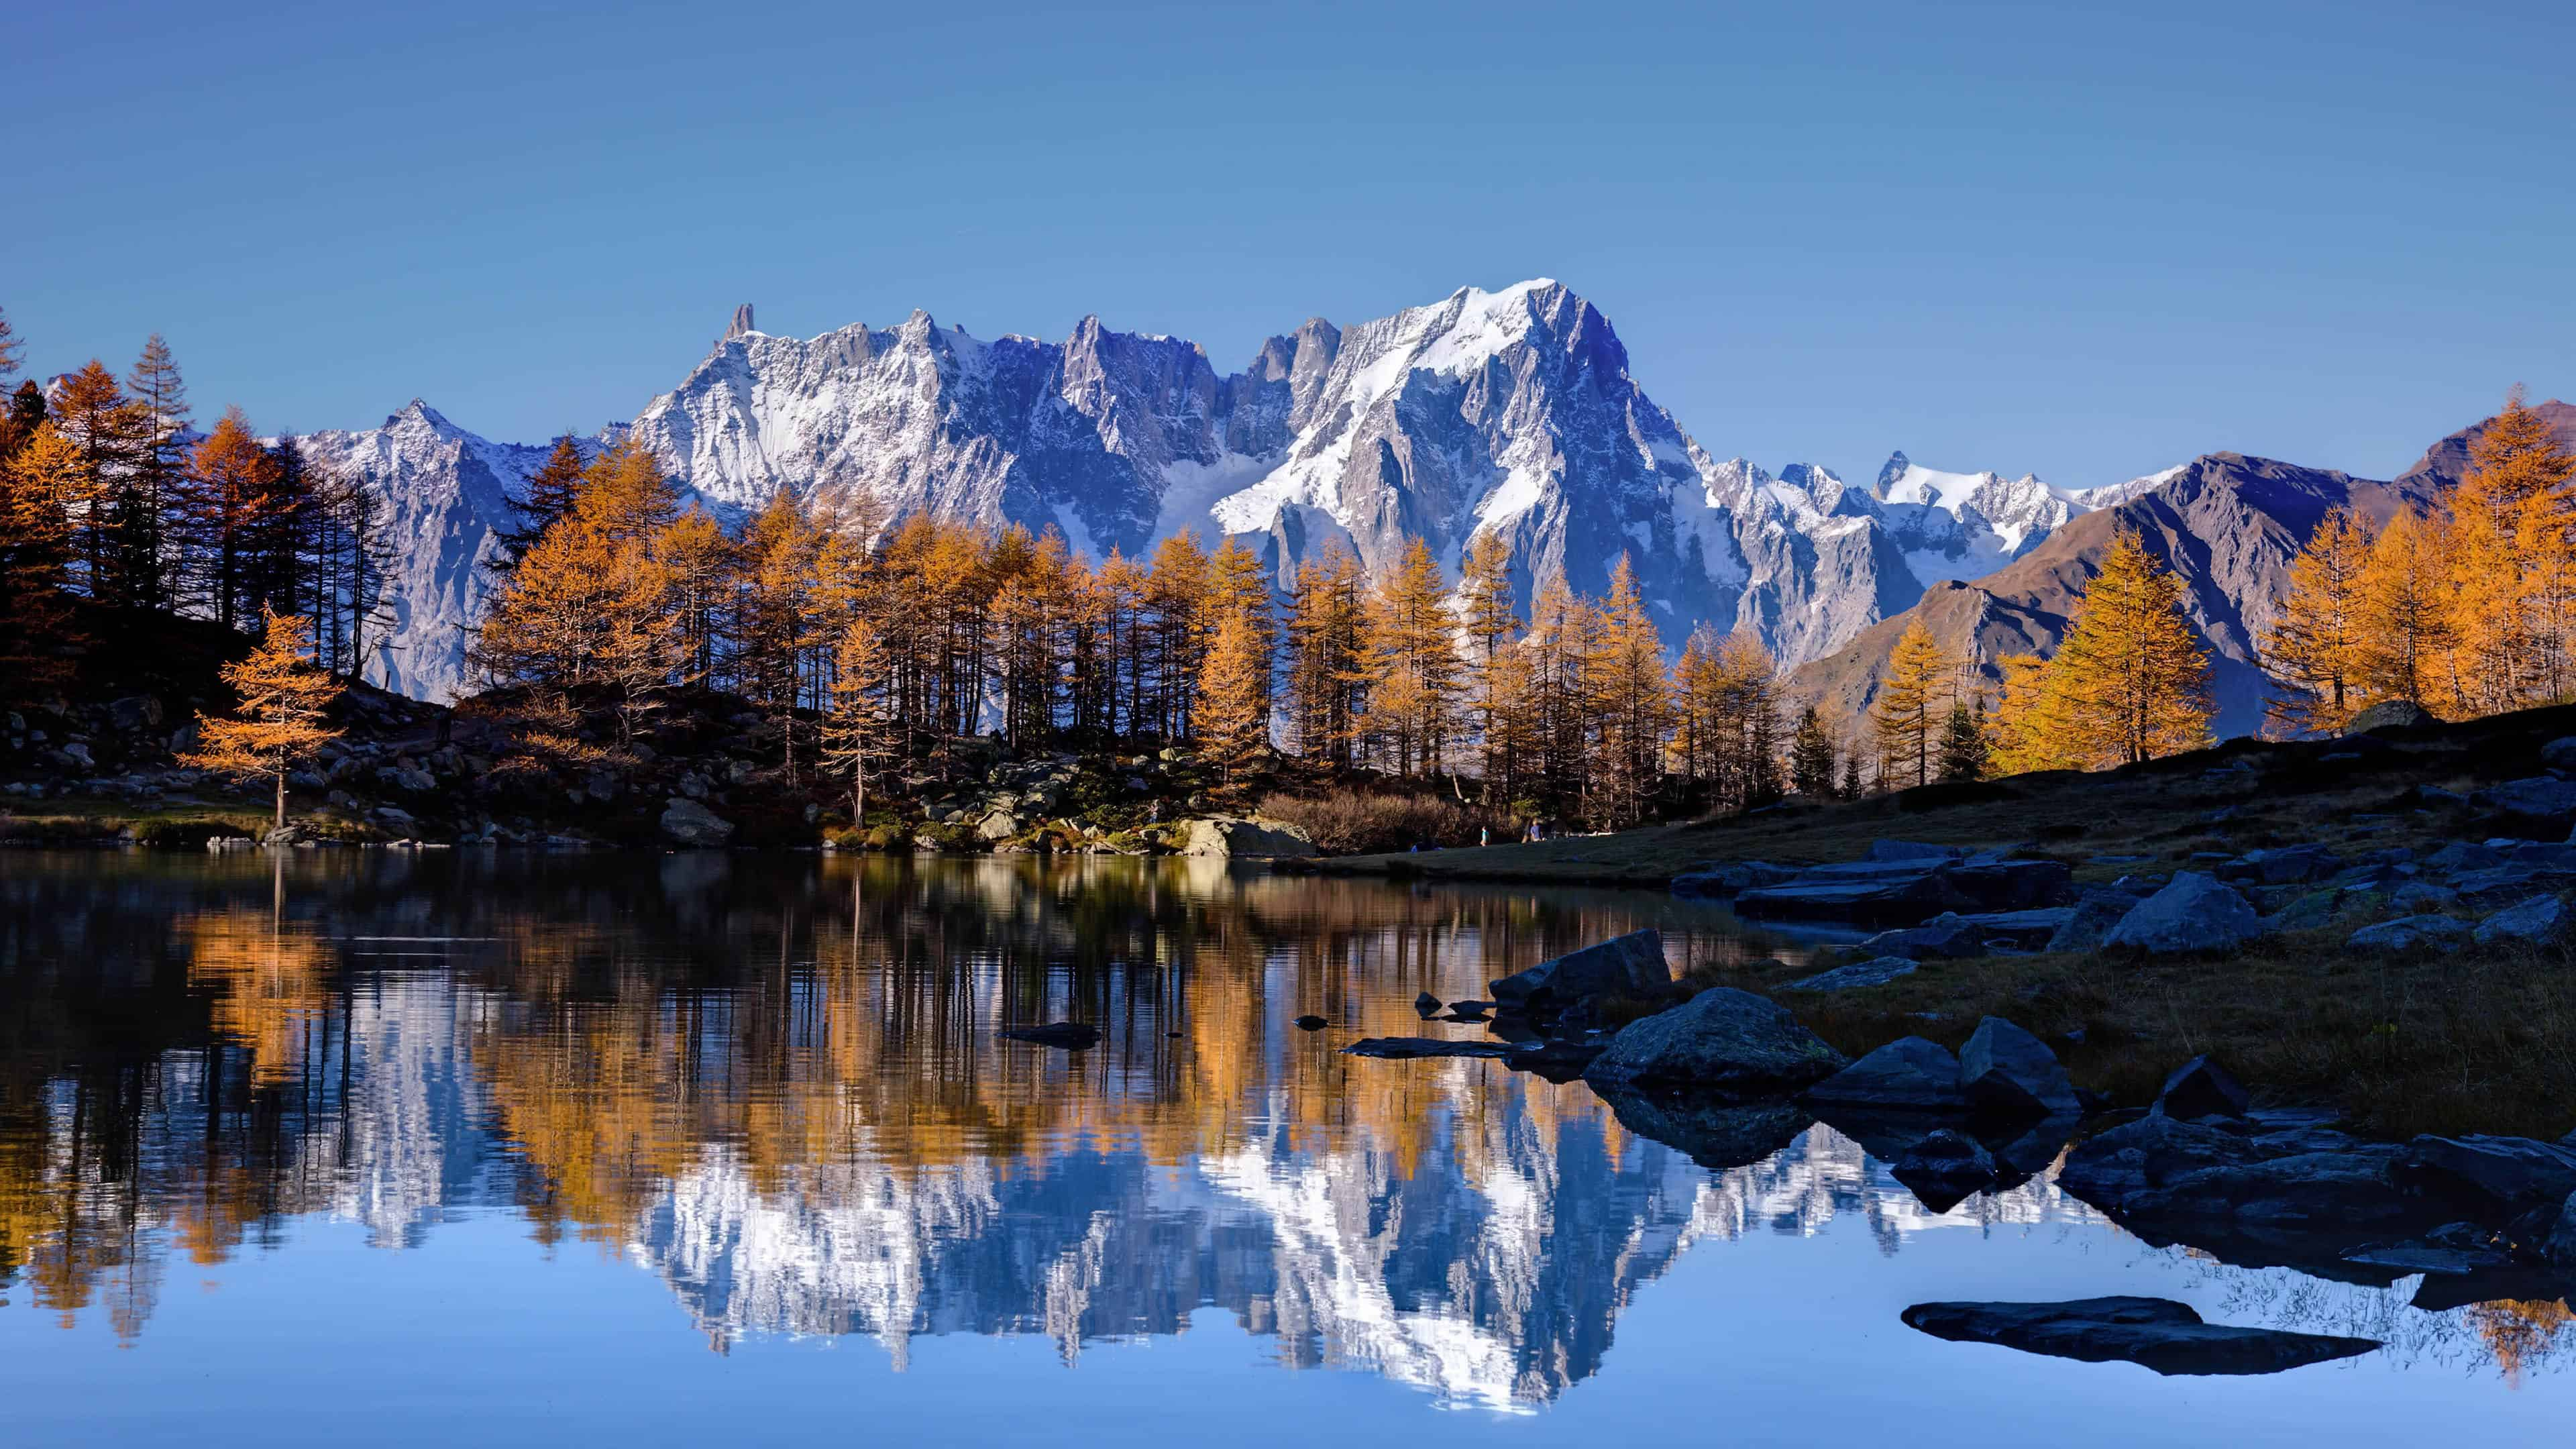 Mont Blanc Mountains In Autumn Uhd 4k Wallpaper Pixelz